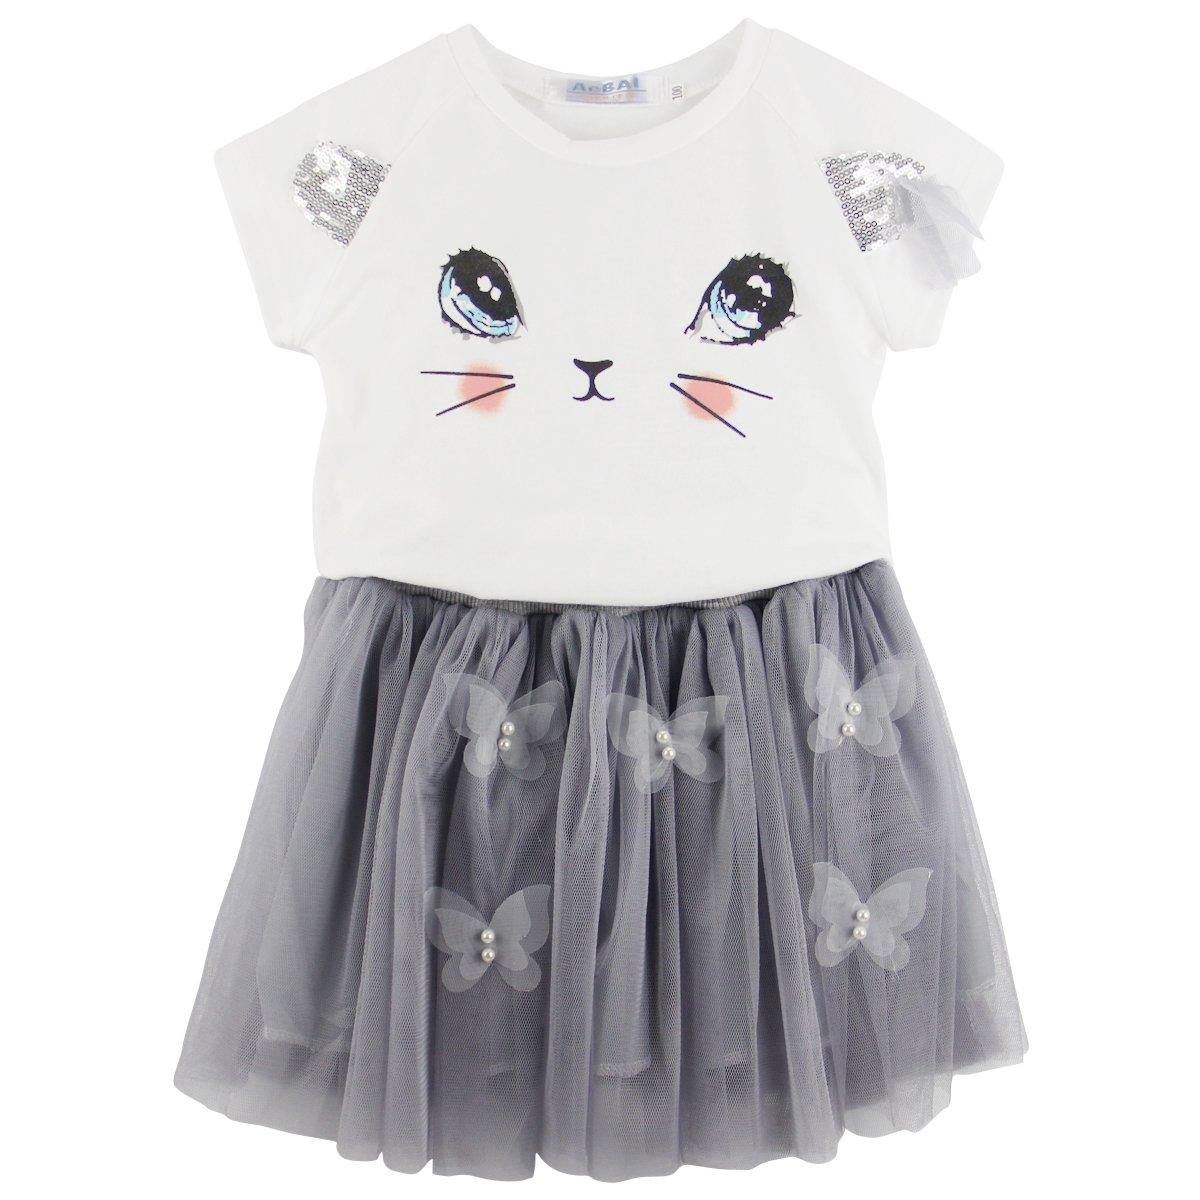 6c3ed3f211ca Amazon.com: Jastore Kids Girls Cute Cat Pattern Clothing Sets Top + Tutu  Skirt: Clothing